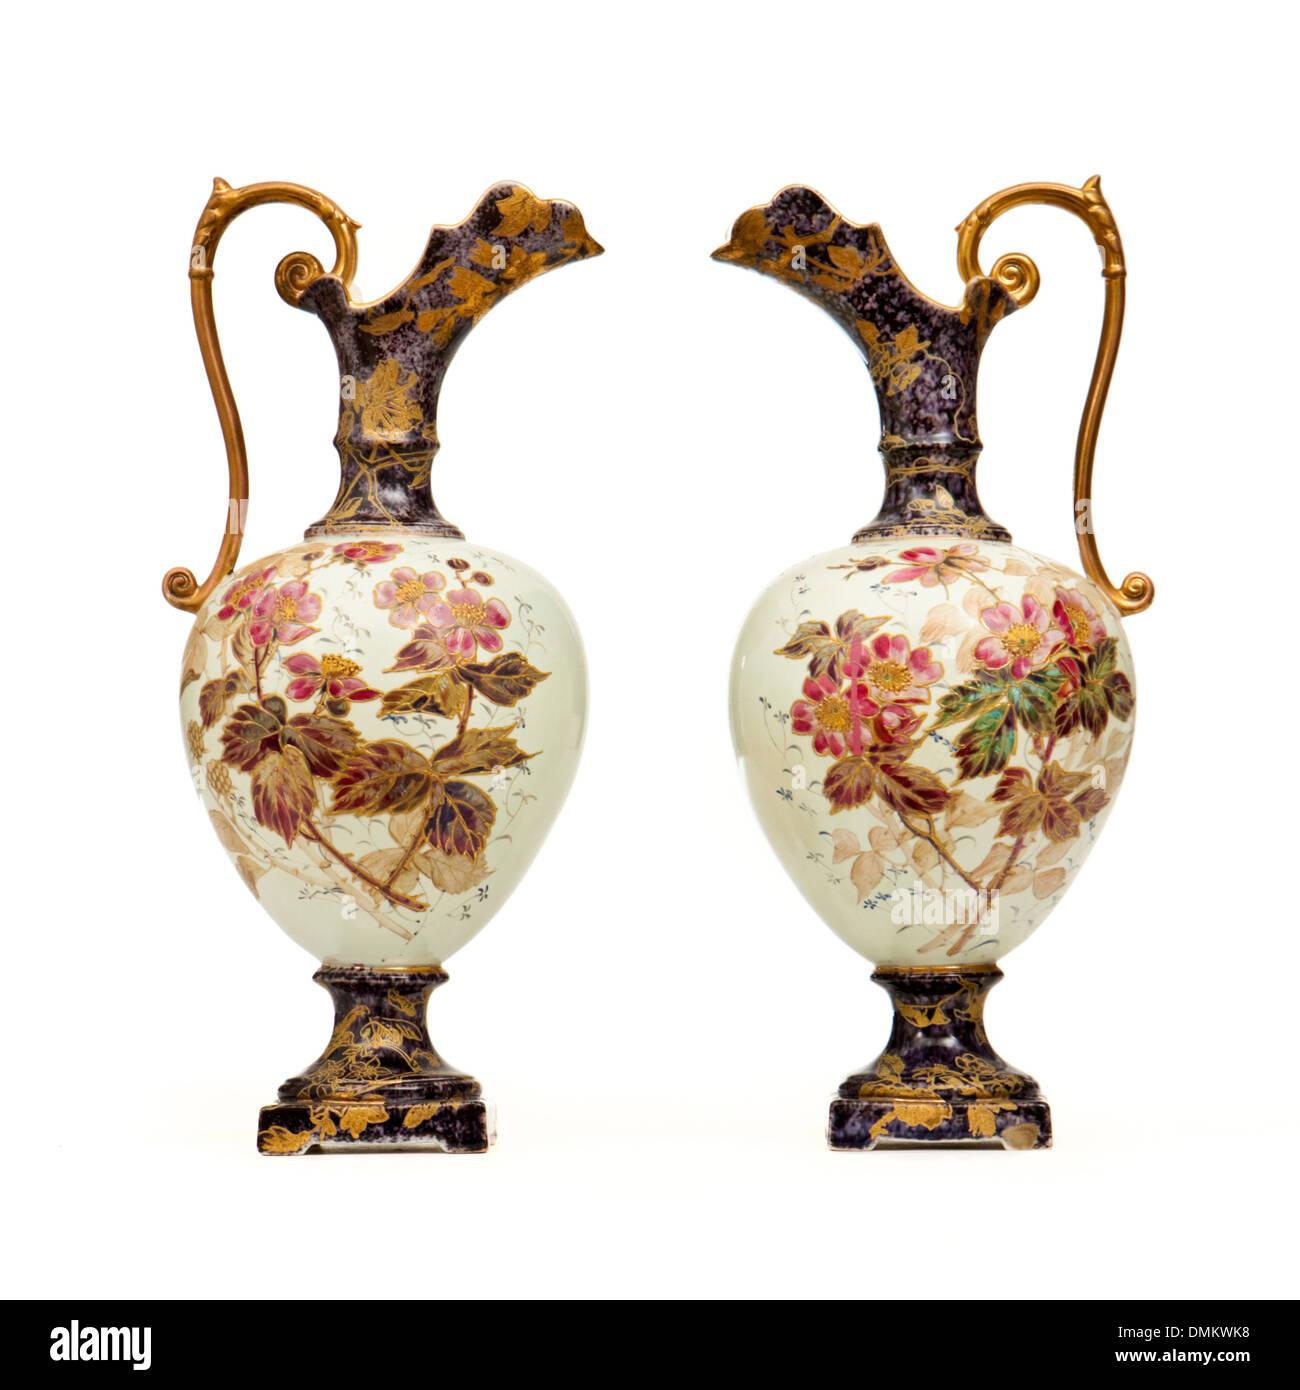 Pair of antique handpainted jugs vases by the rubian art pottery pair of antique handpainted jugs vases by the rubian art pottery subsidiary of grimwades reviewsmspy